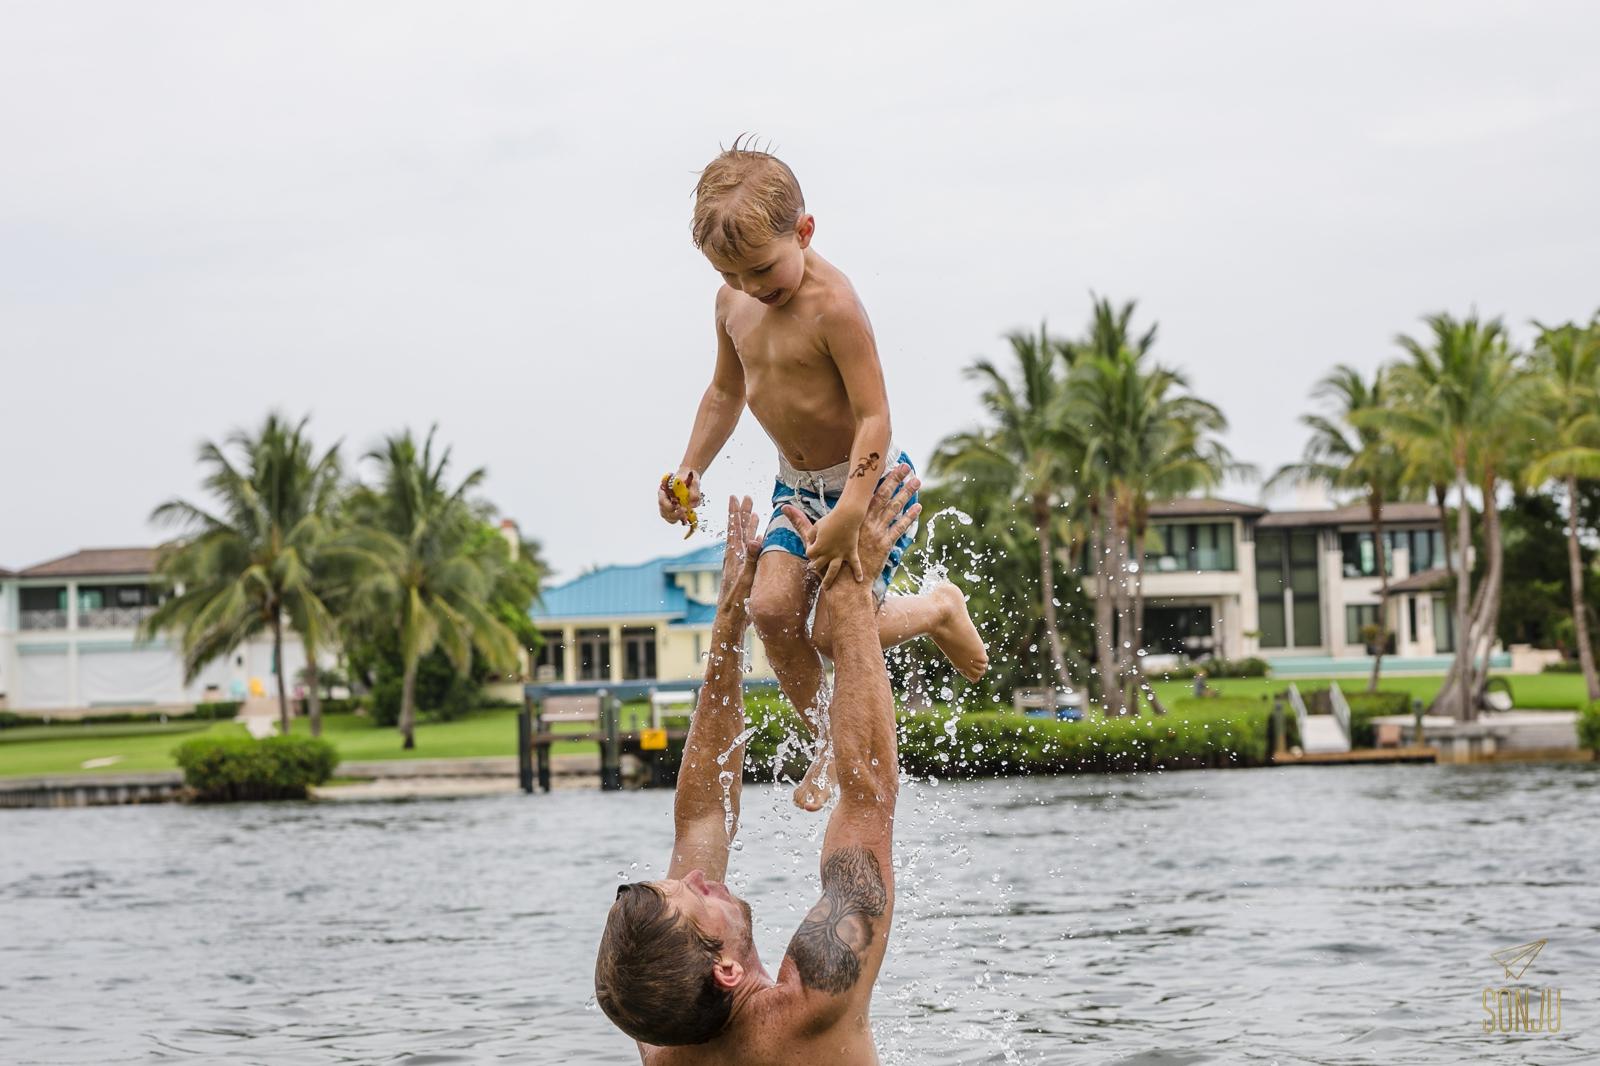 Florida-family-photography-documentary-DITL-Jupiter-Sonju00020.jpg